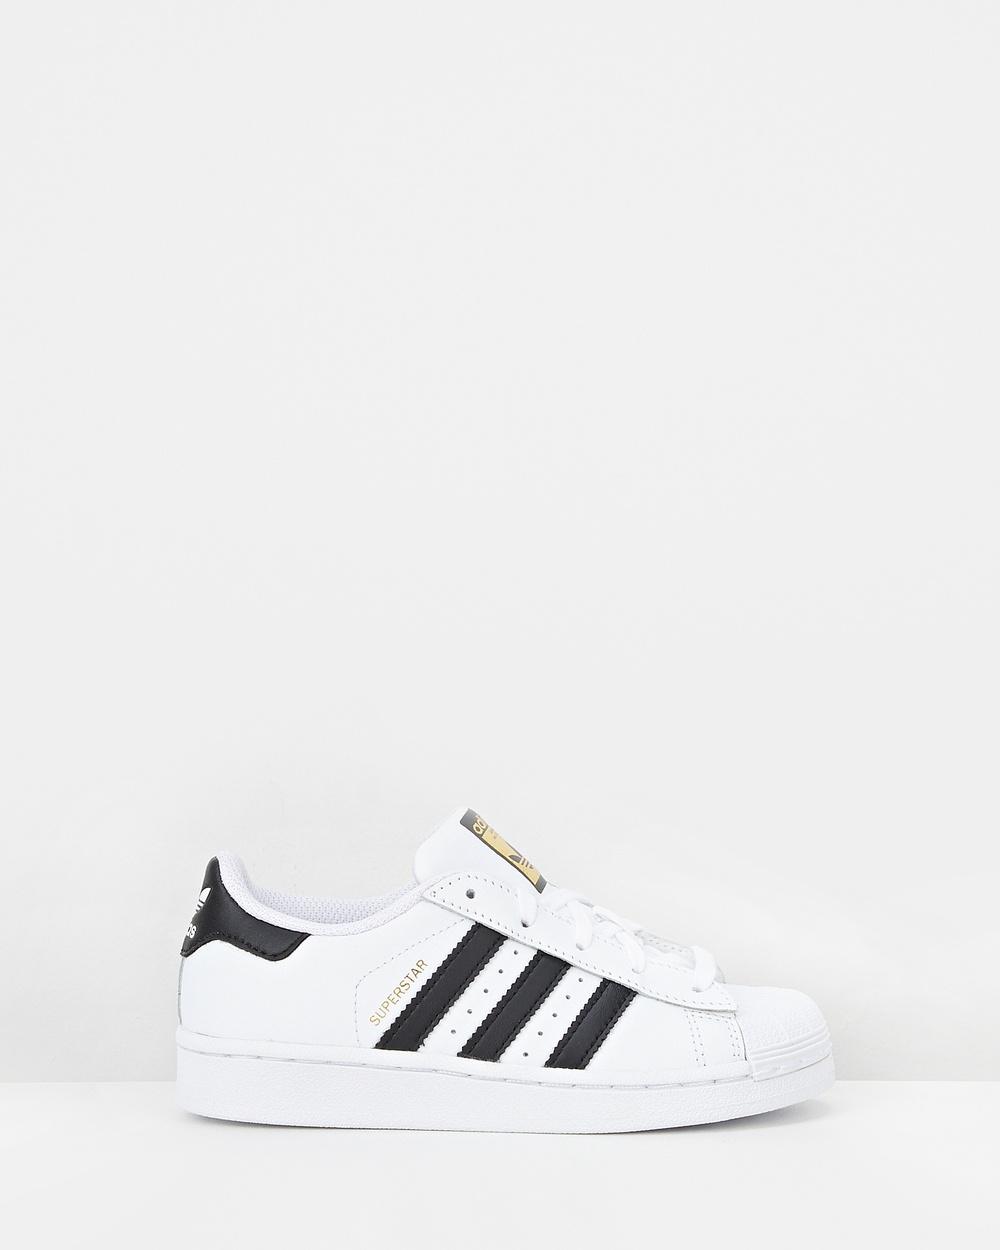 adidas Originals Superstar Foundation Pre School Lifestyle Shoes White/Black